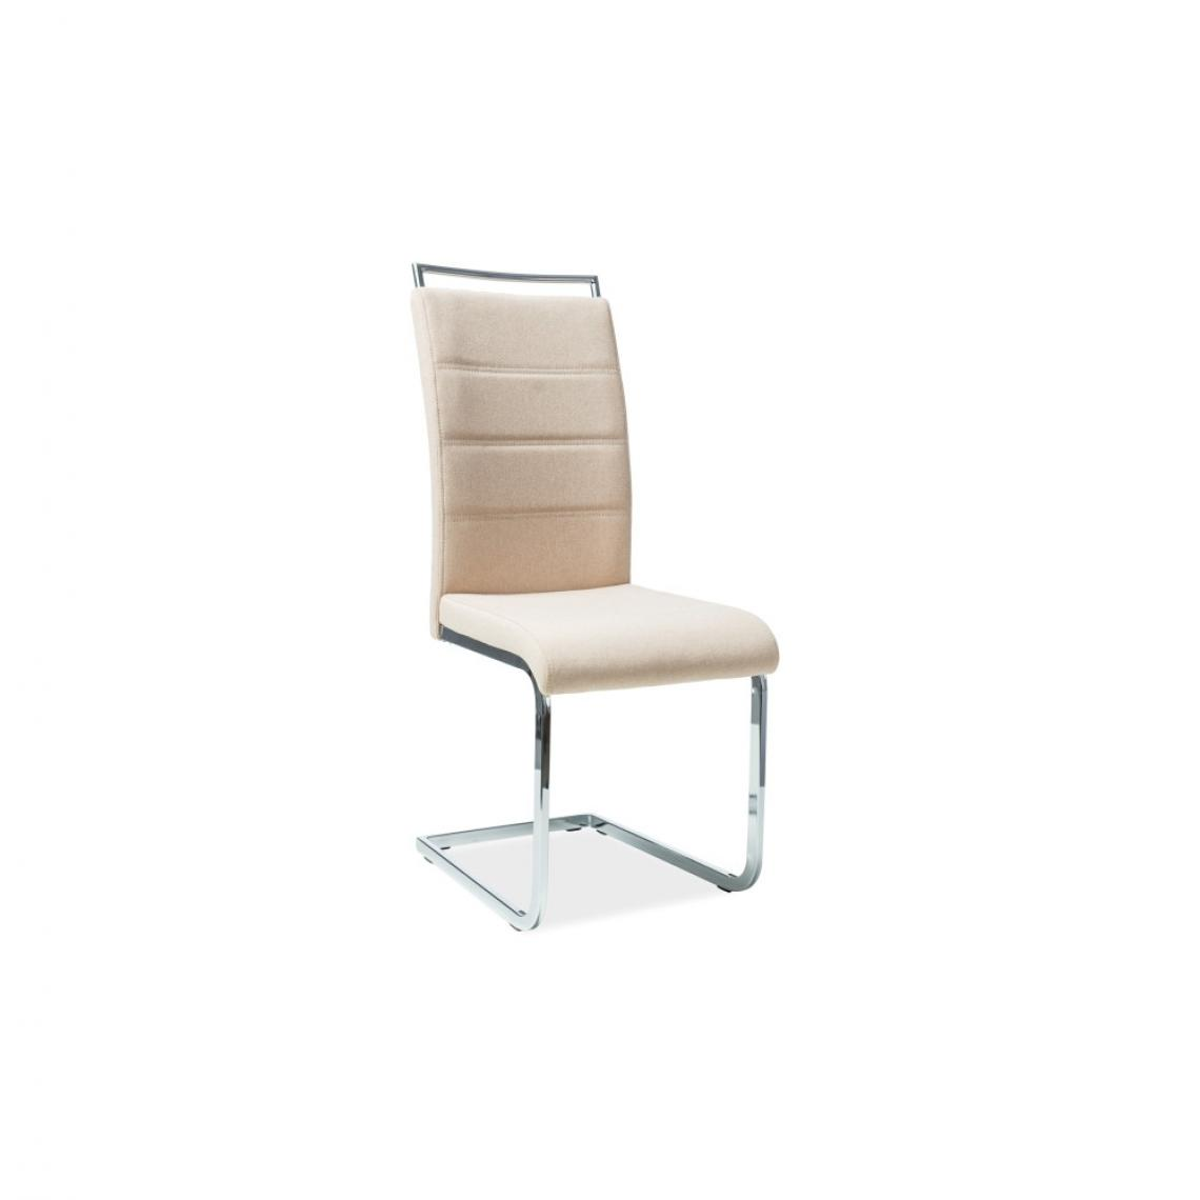 Ac-Deco Chaise en tissu - H441 - 42 x 41 x 102 cm - Beige